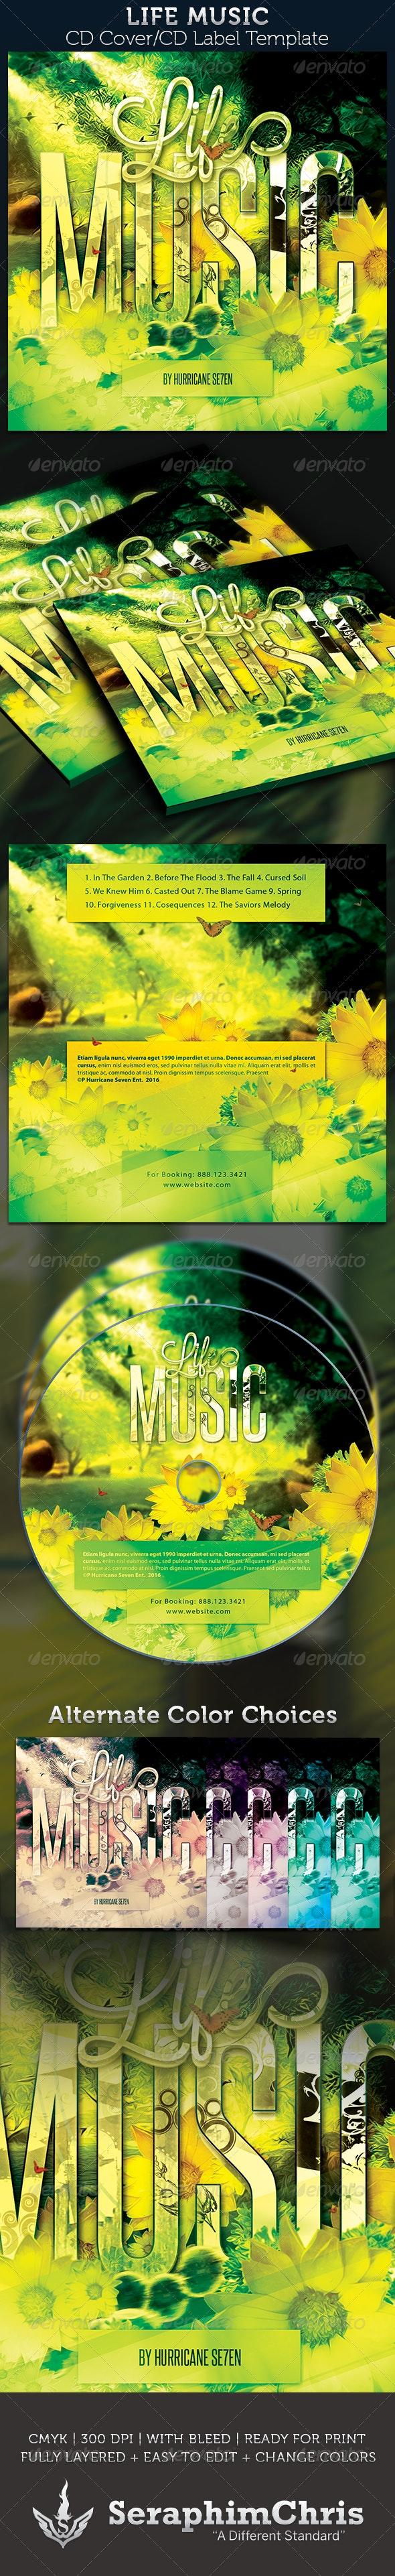 10 Best CD & DVD Artwork Templates  for July 2020